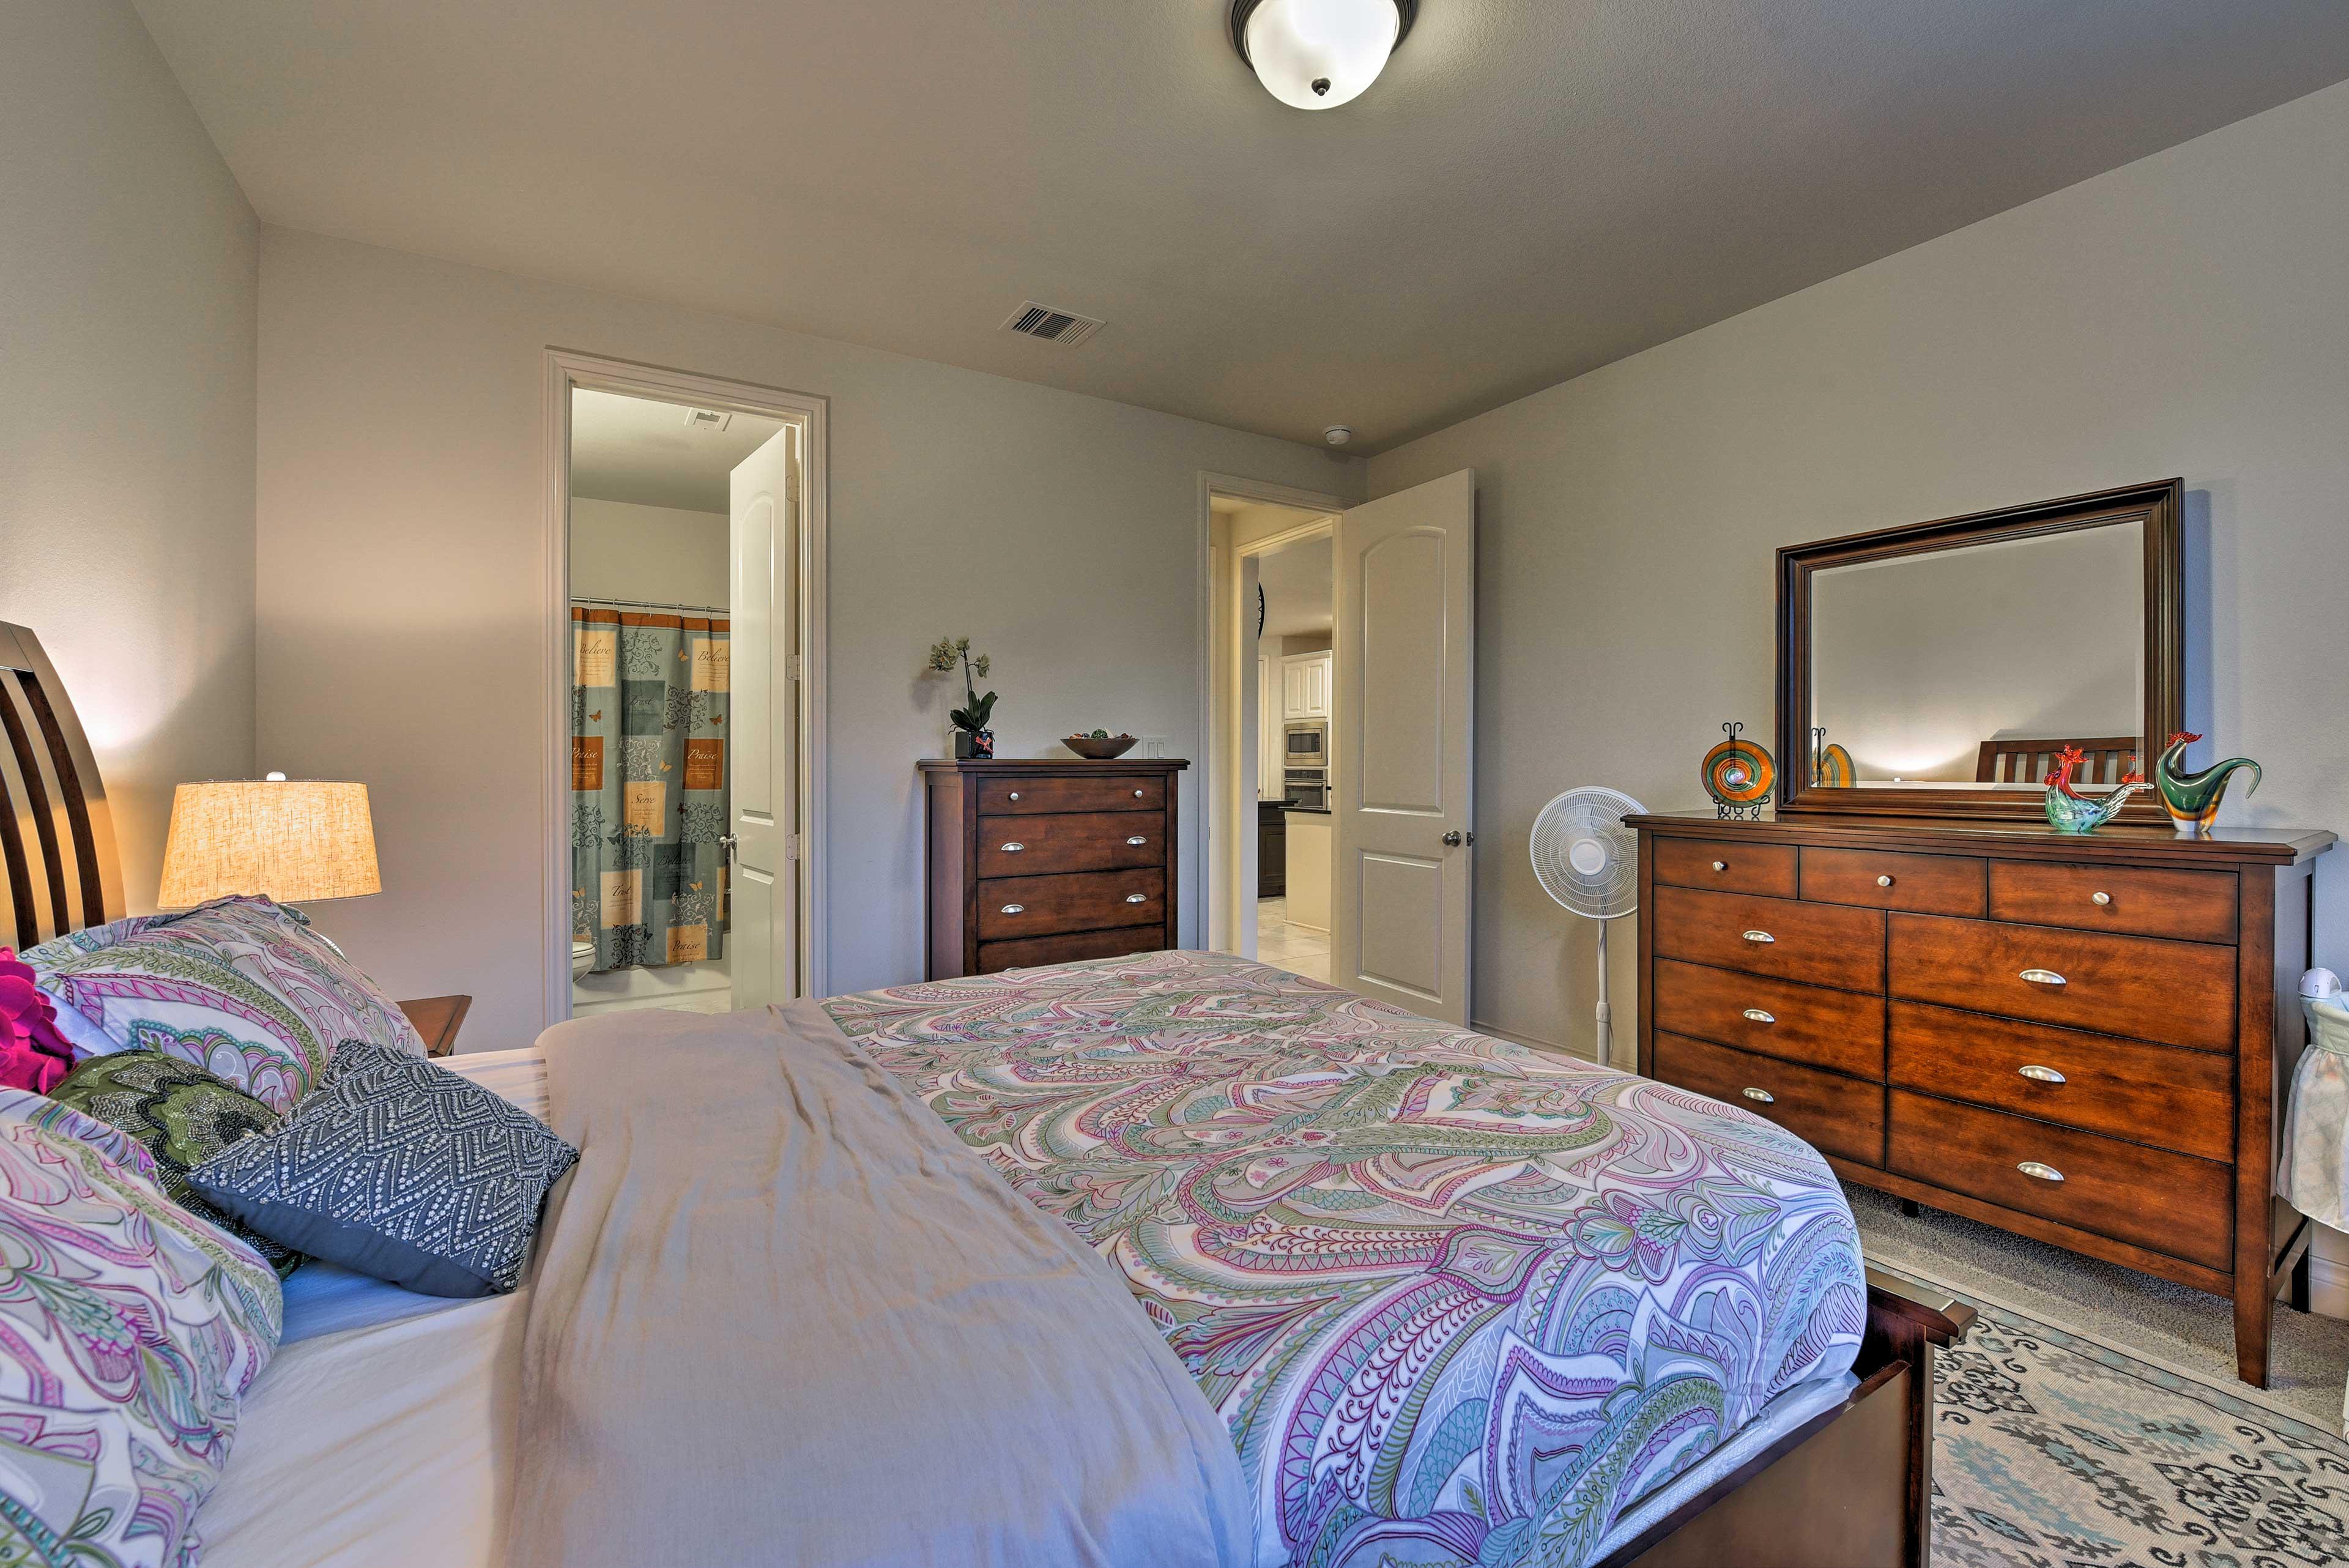 Wood furnishings make this room feel warm and cozy.